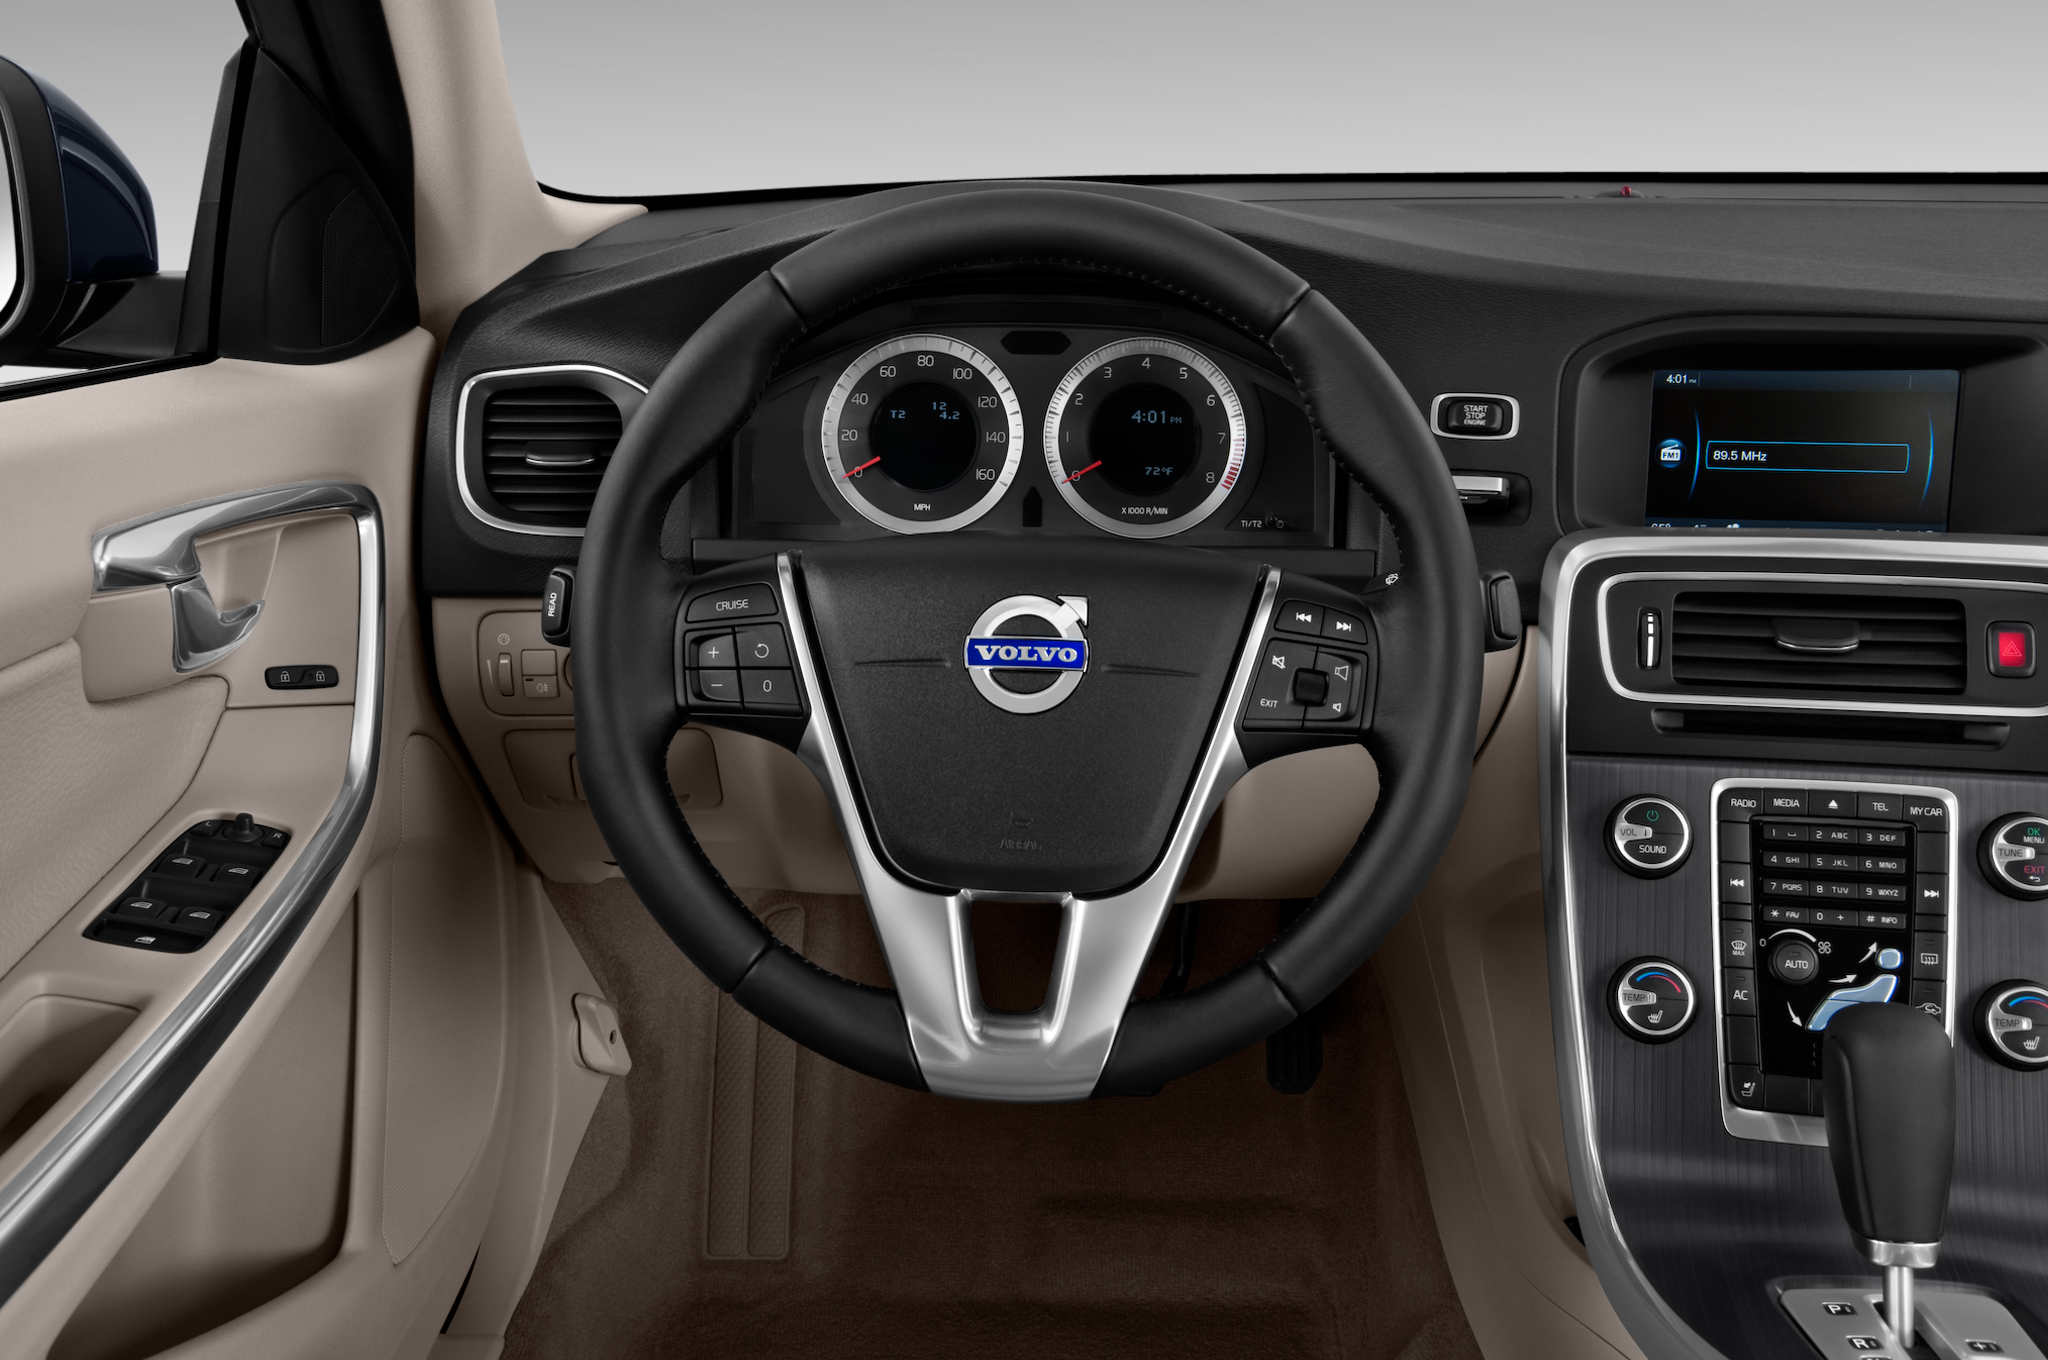 first drive: 2012 volvo s60 t6 awd r-design - automobile magazine